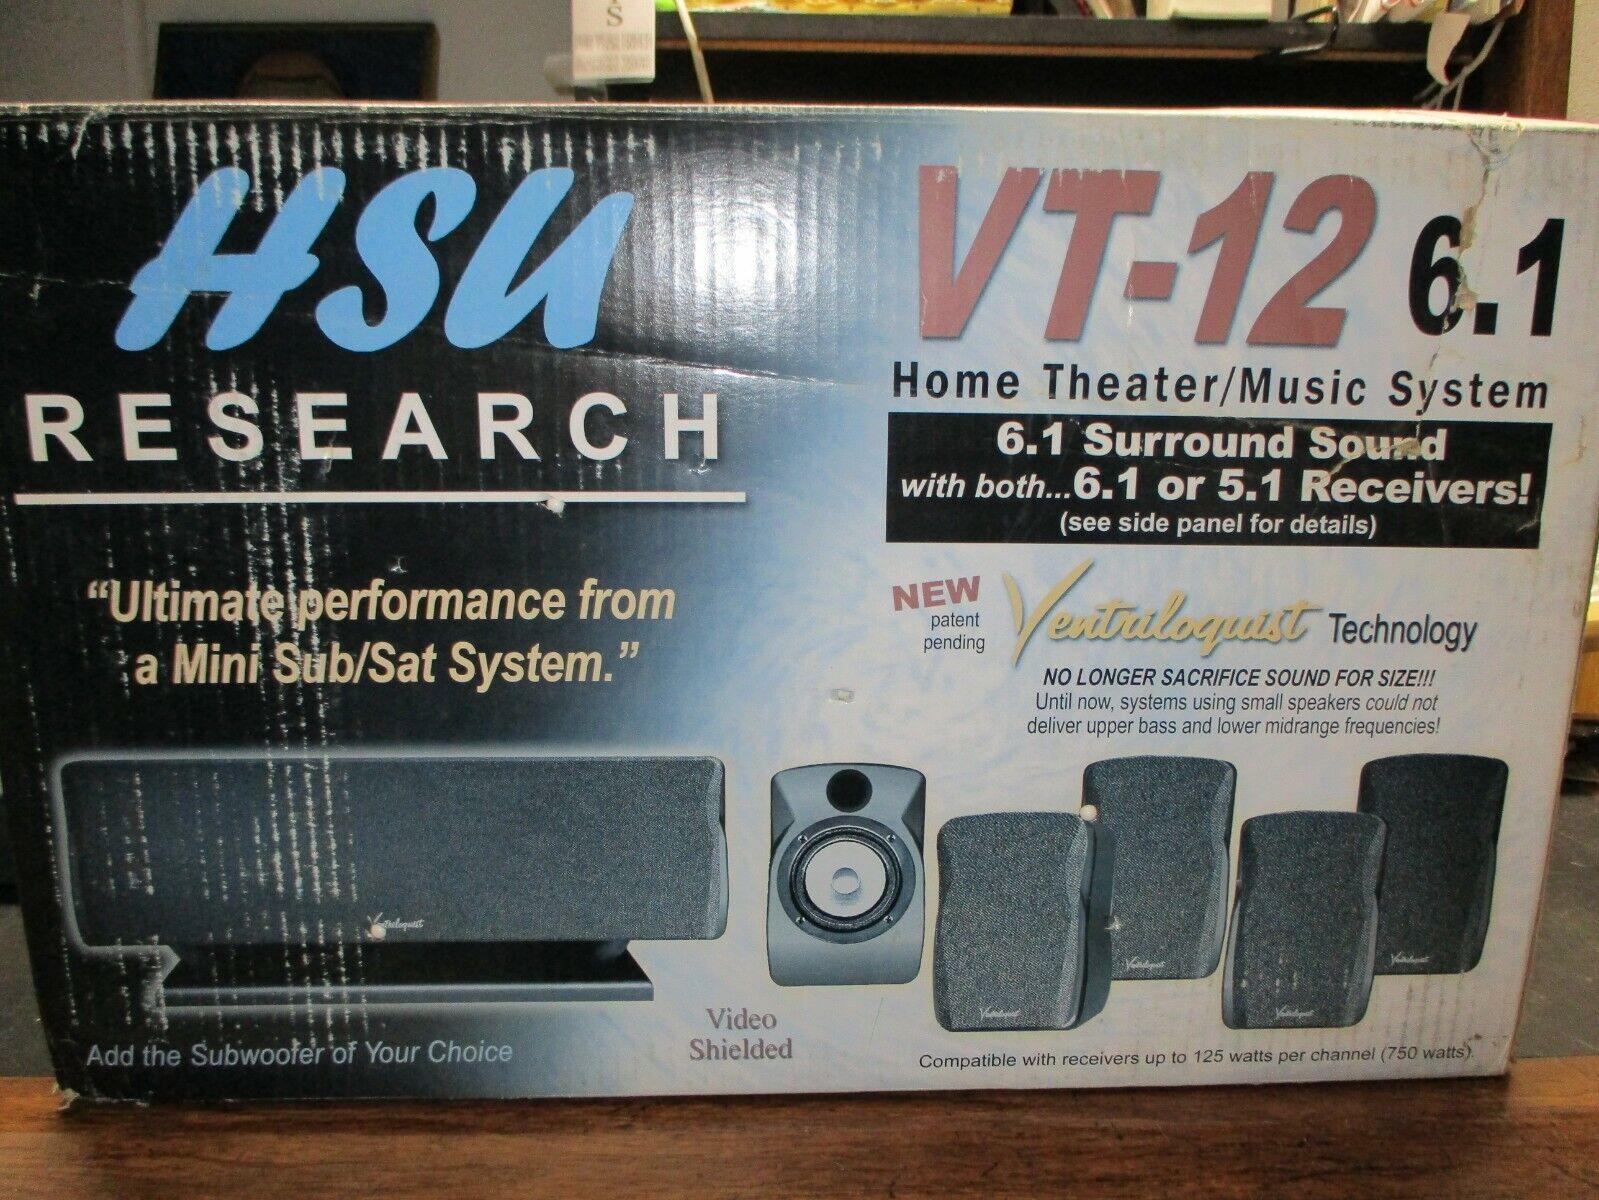 surround sound system h s u research